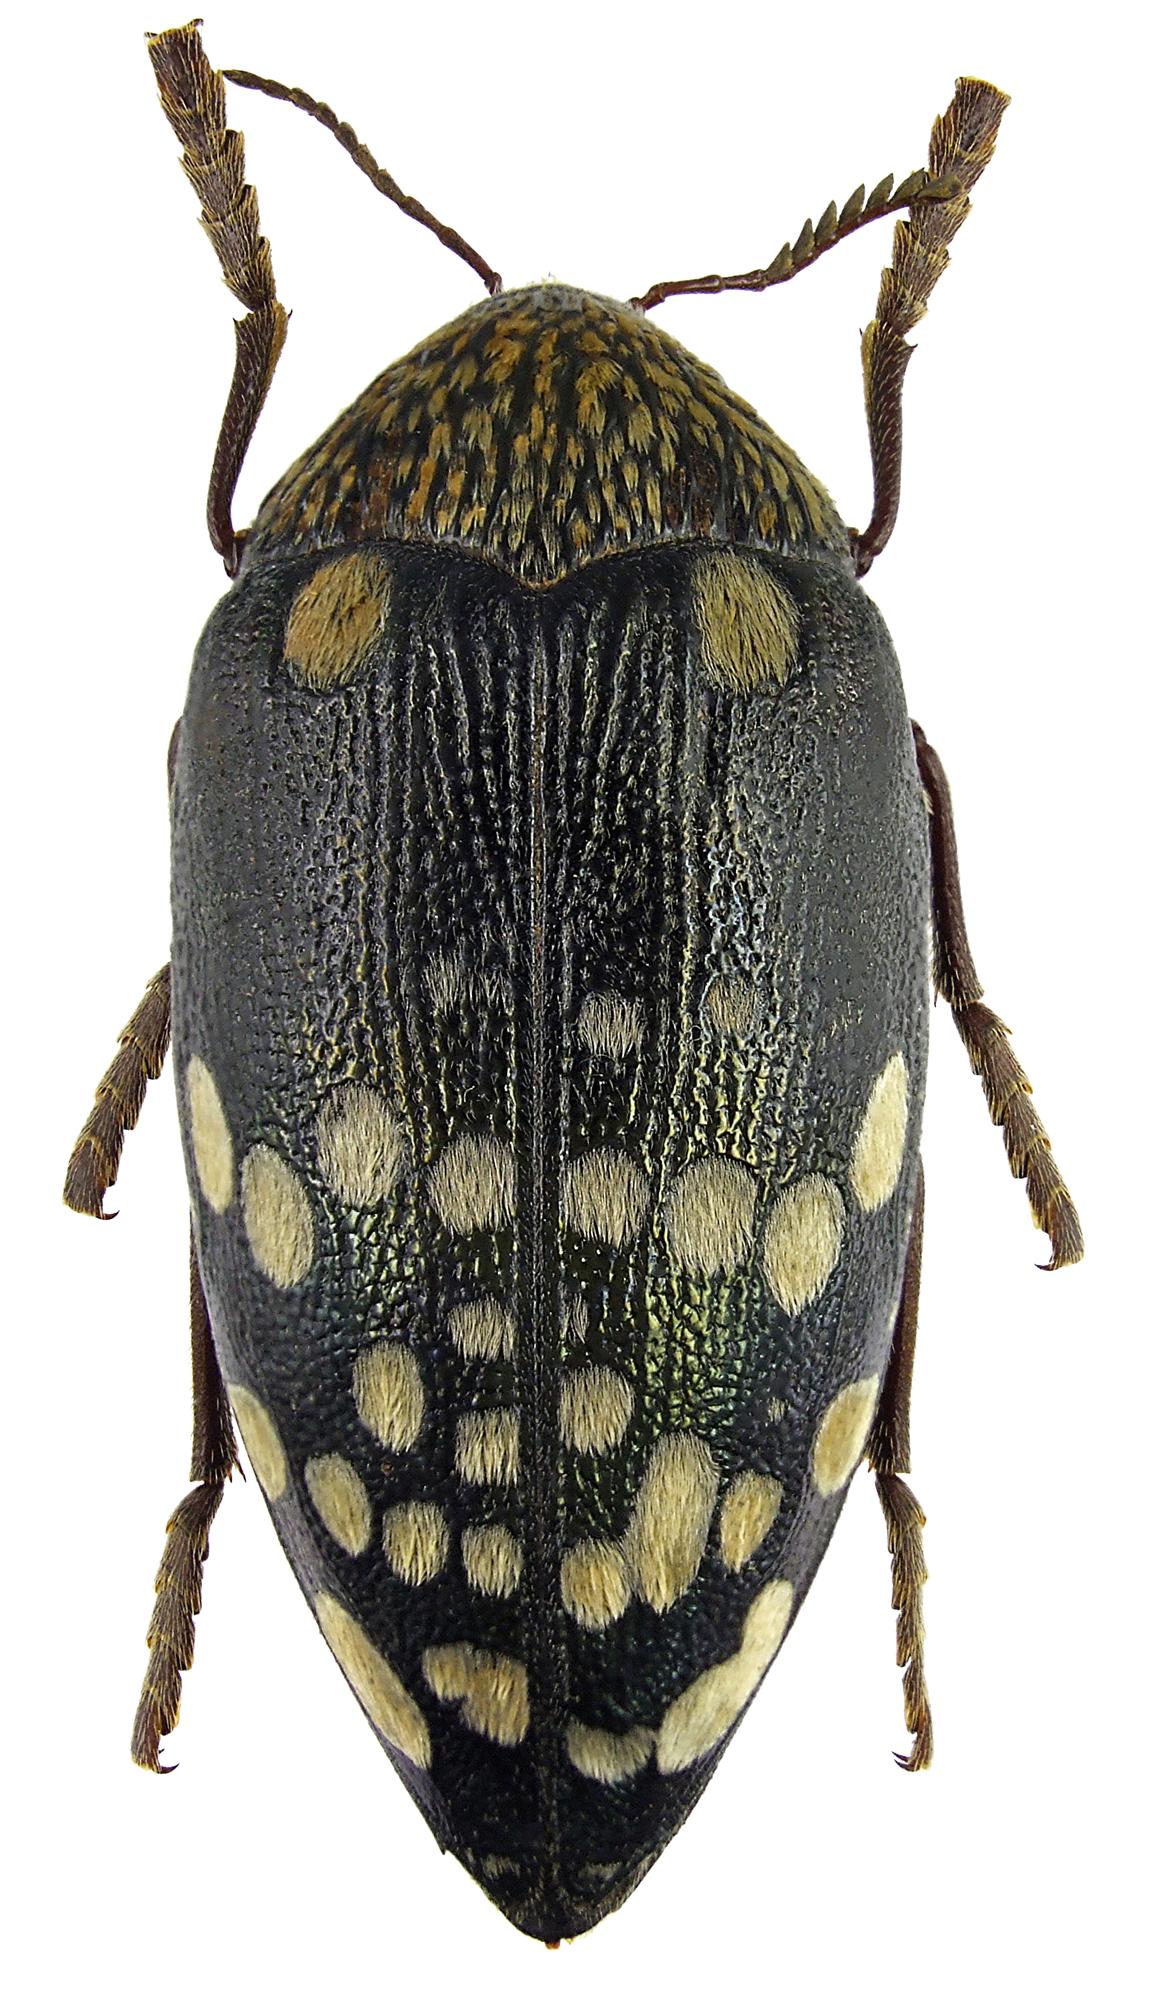 Sternocera boucardi 73586cz99.jpg